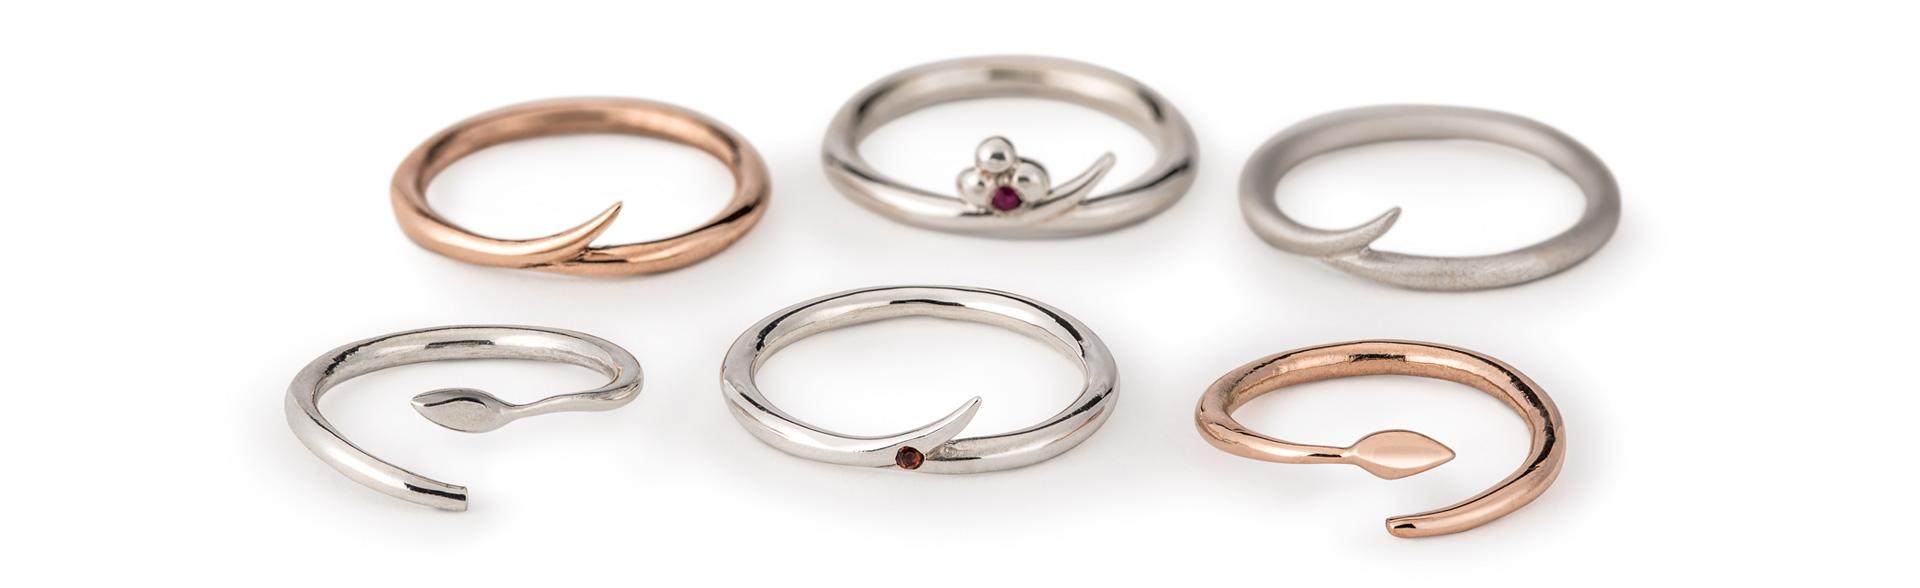 india-rings